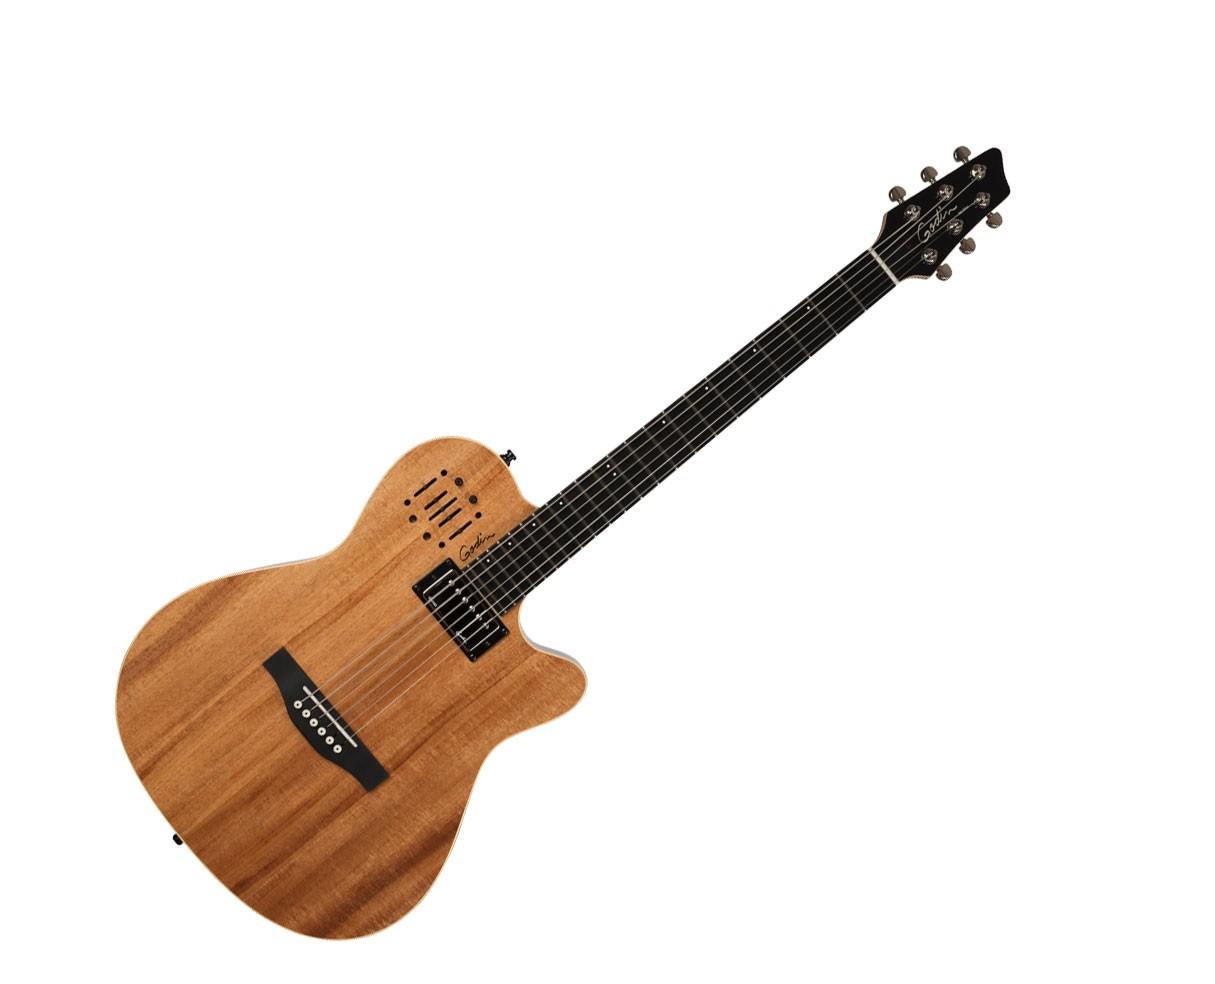 Godin Guitars A 6 ULTRA 6-String Electric Guitar in Koa HG Limited Edition